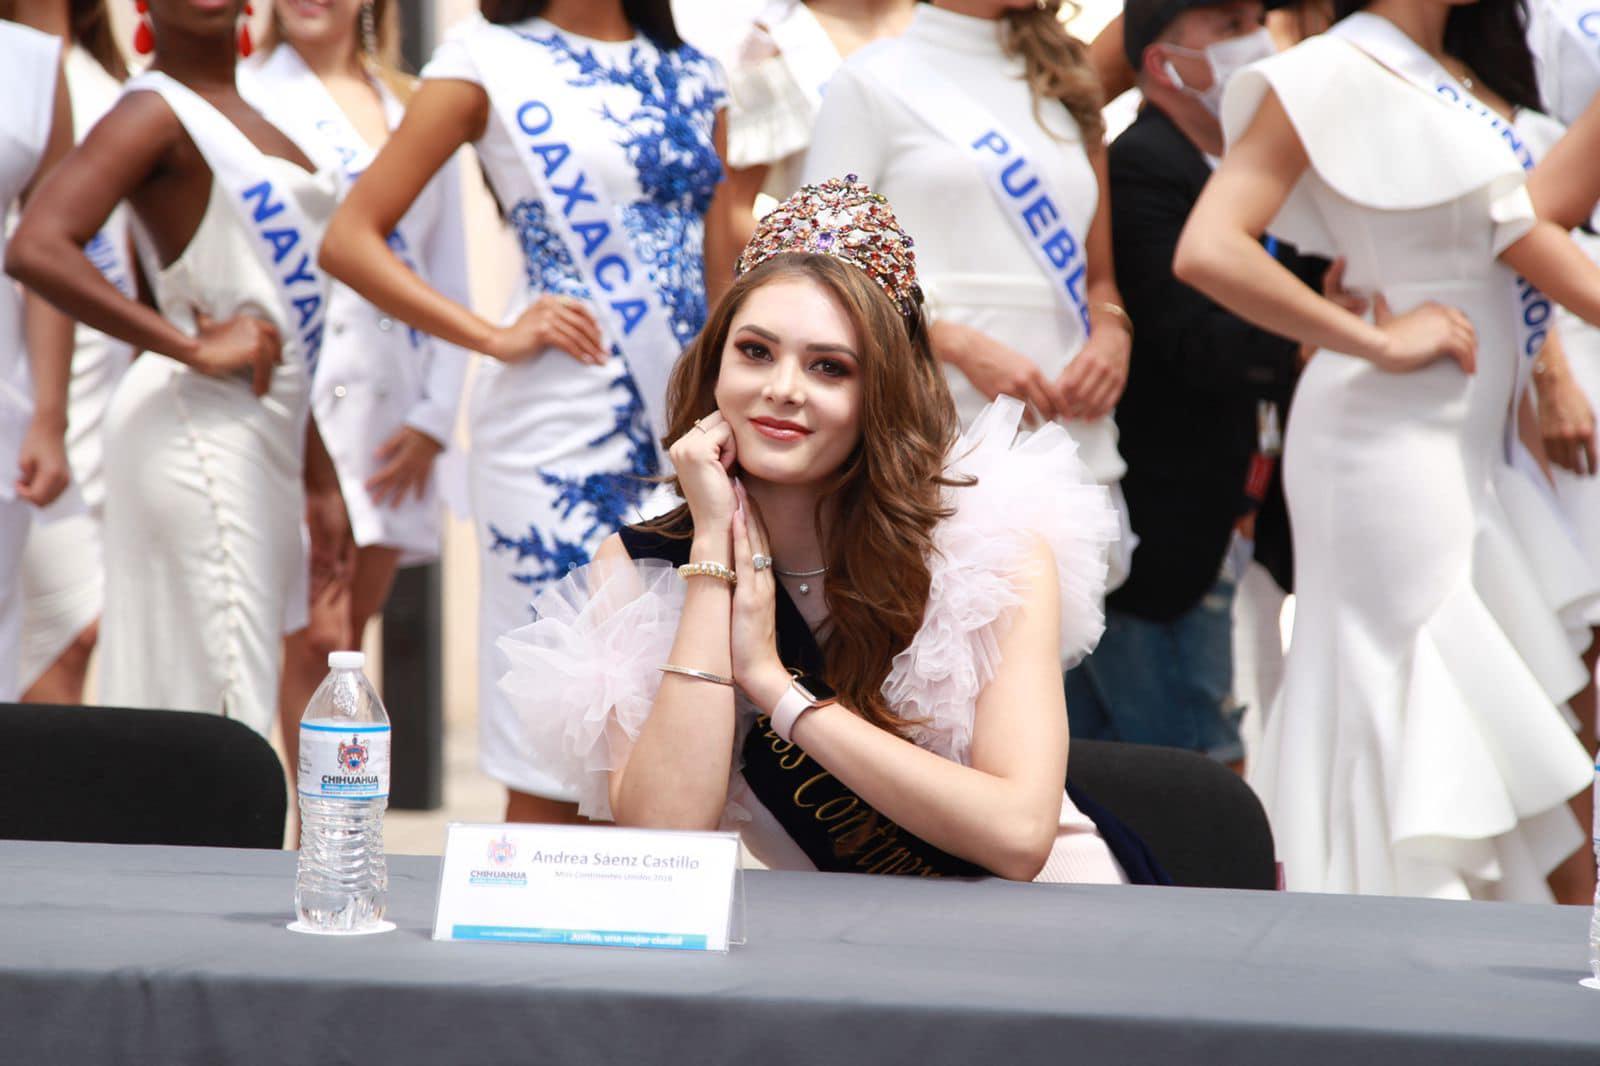 andrea saenz, miss continentes unidos 2018. - Página 6 20048110